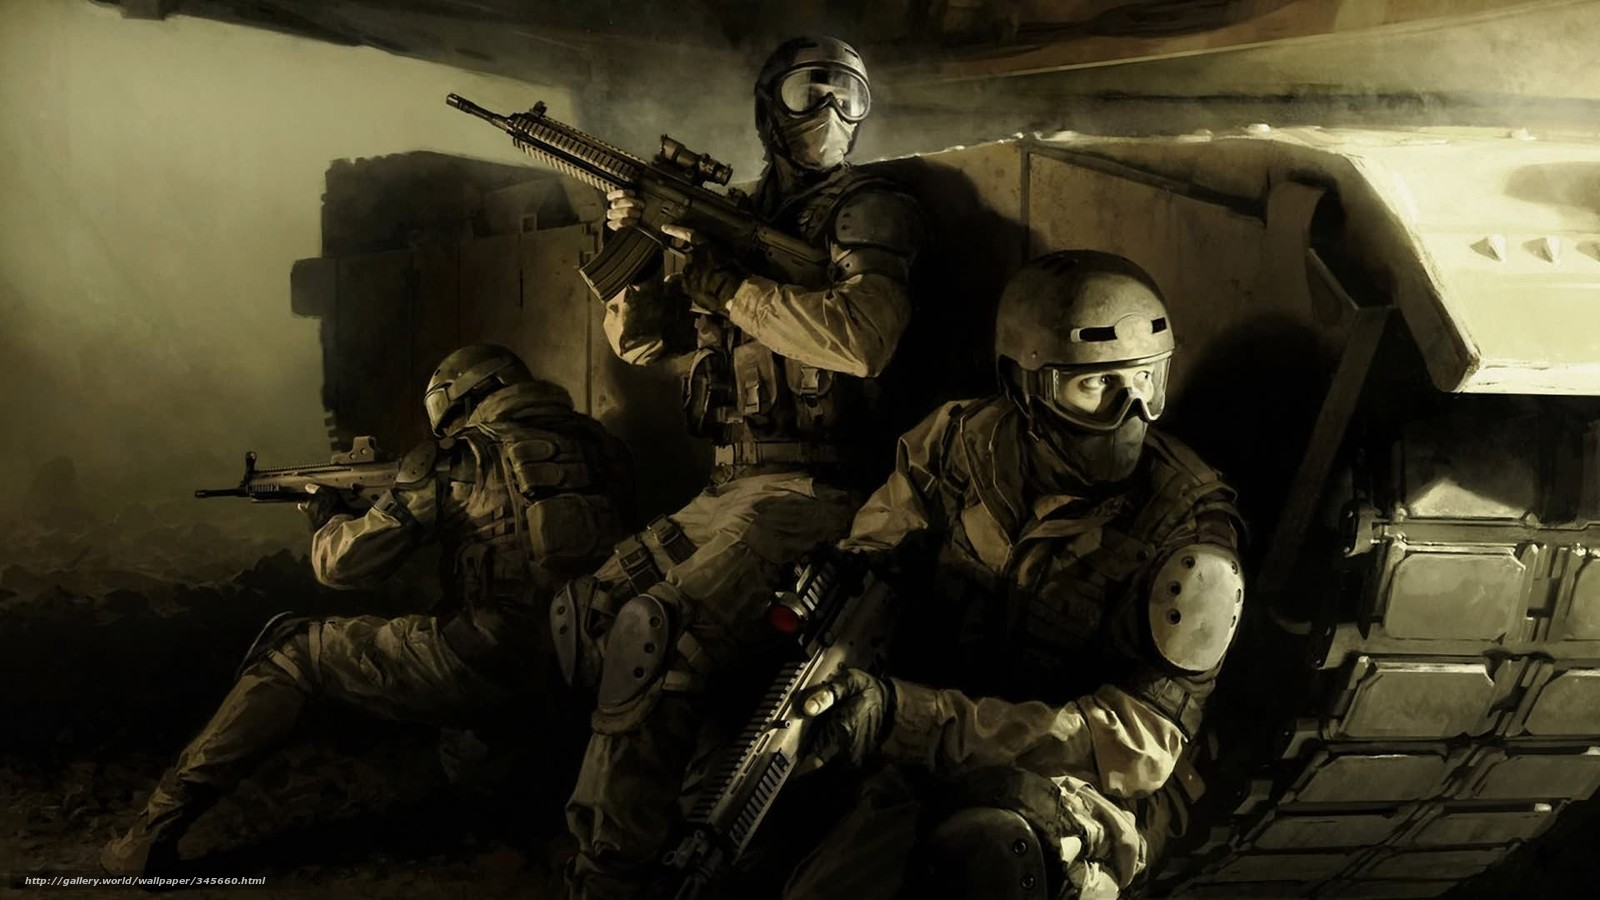 Download wallpaper Special Forces weapon machines tank desktop 1600x900